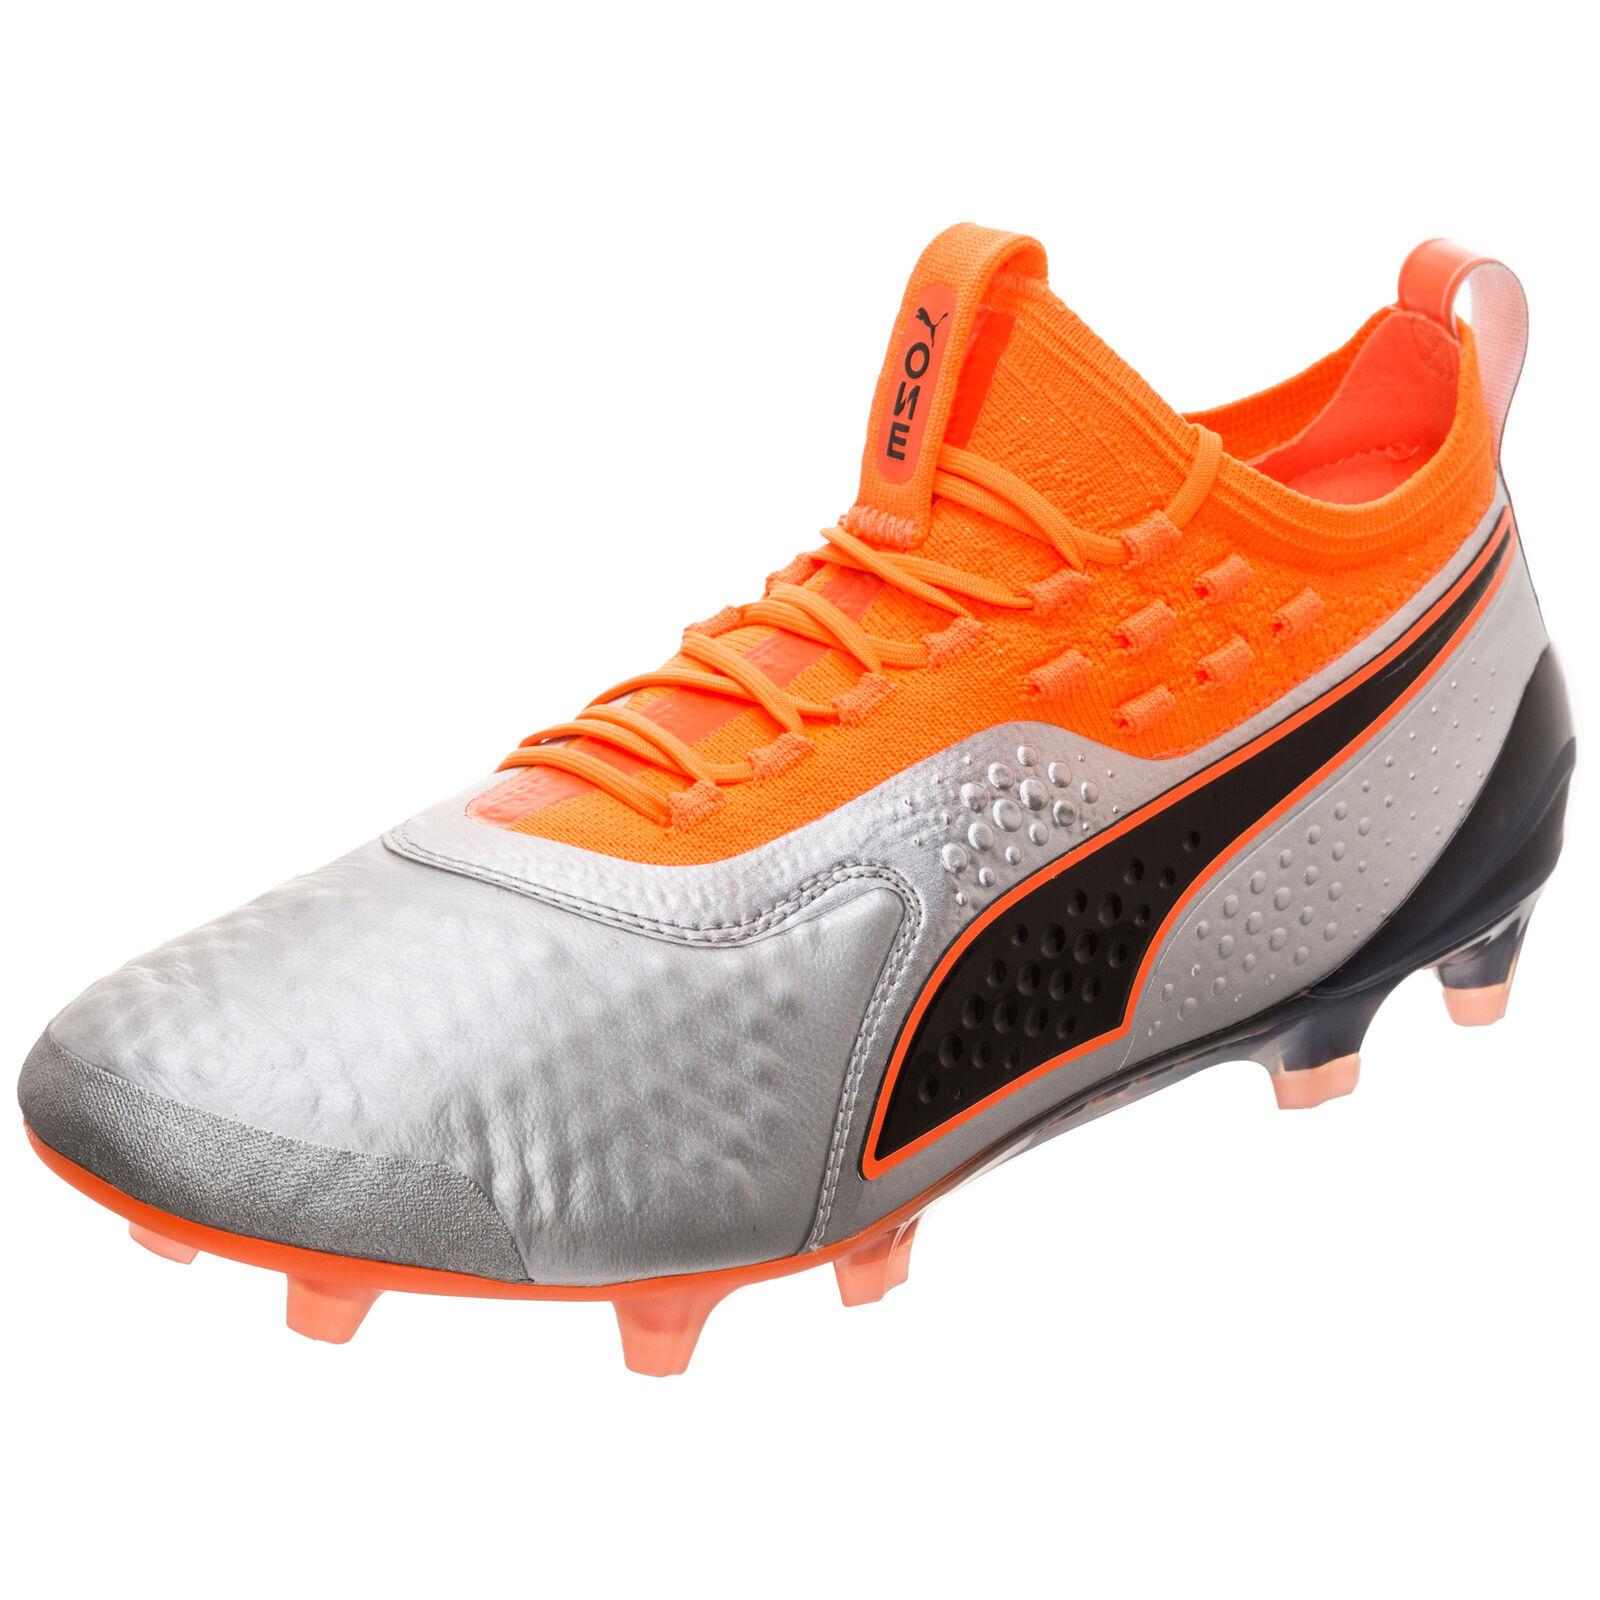 Puma Puma ONE 1 Lth FG AG Fußballschuh Fußballschuh Fußballschuh Herren silber   neon Orange NEU dba376